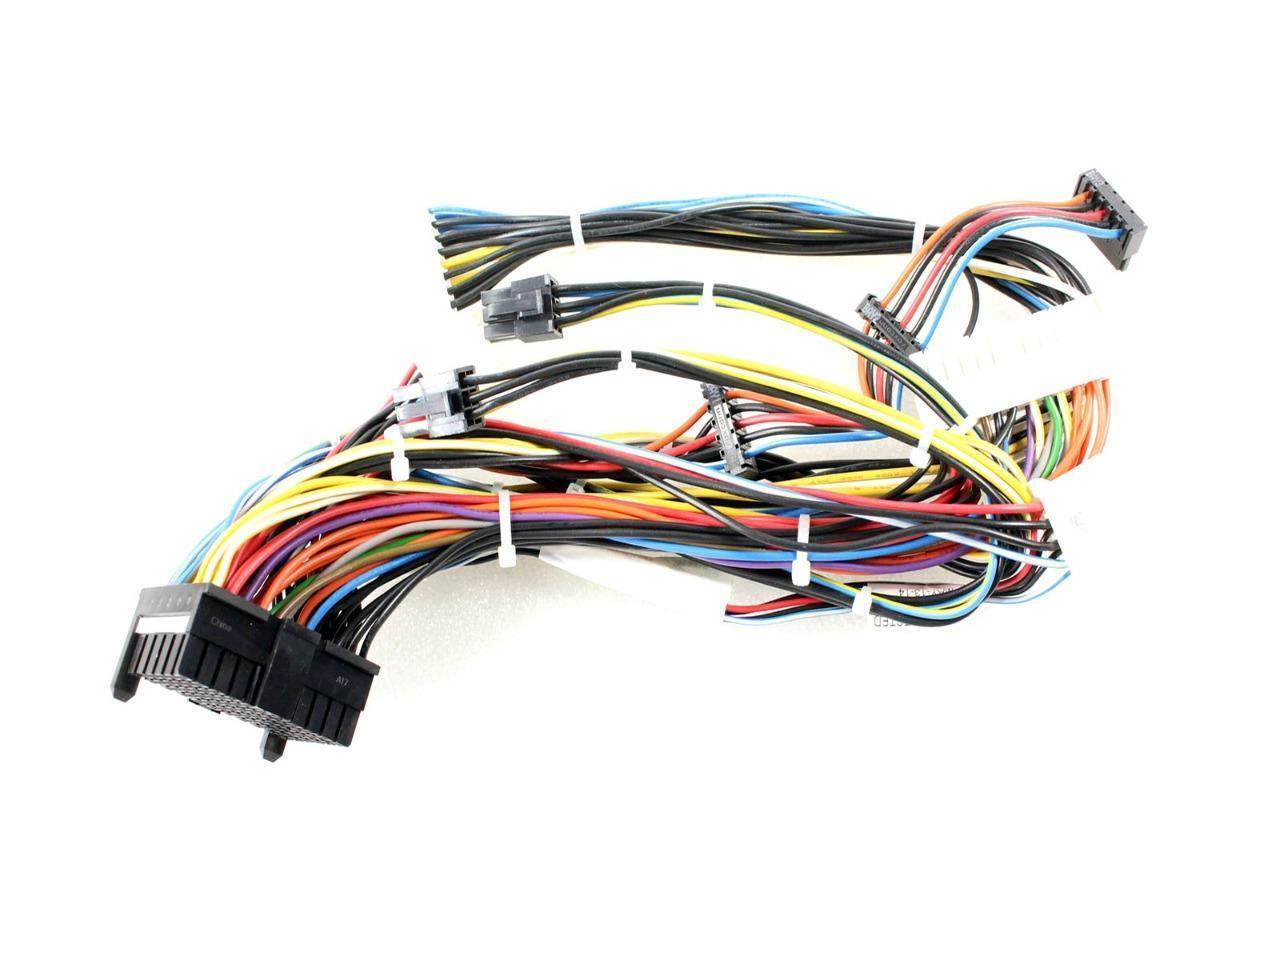 s l1600 dell precision t5400 875 watt power supply wiring harness yn945 igt s2000 power supply wiring harness at bakdesigns.co